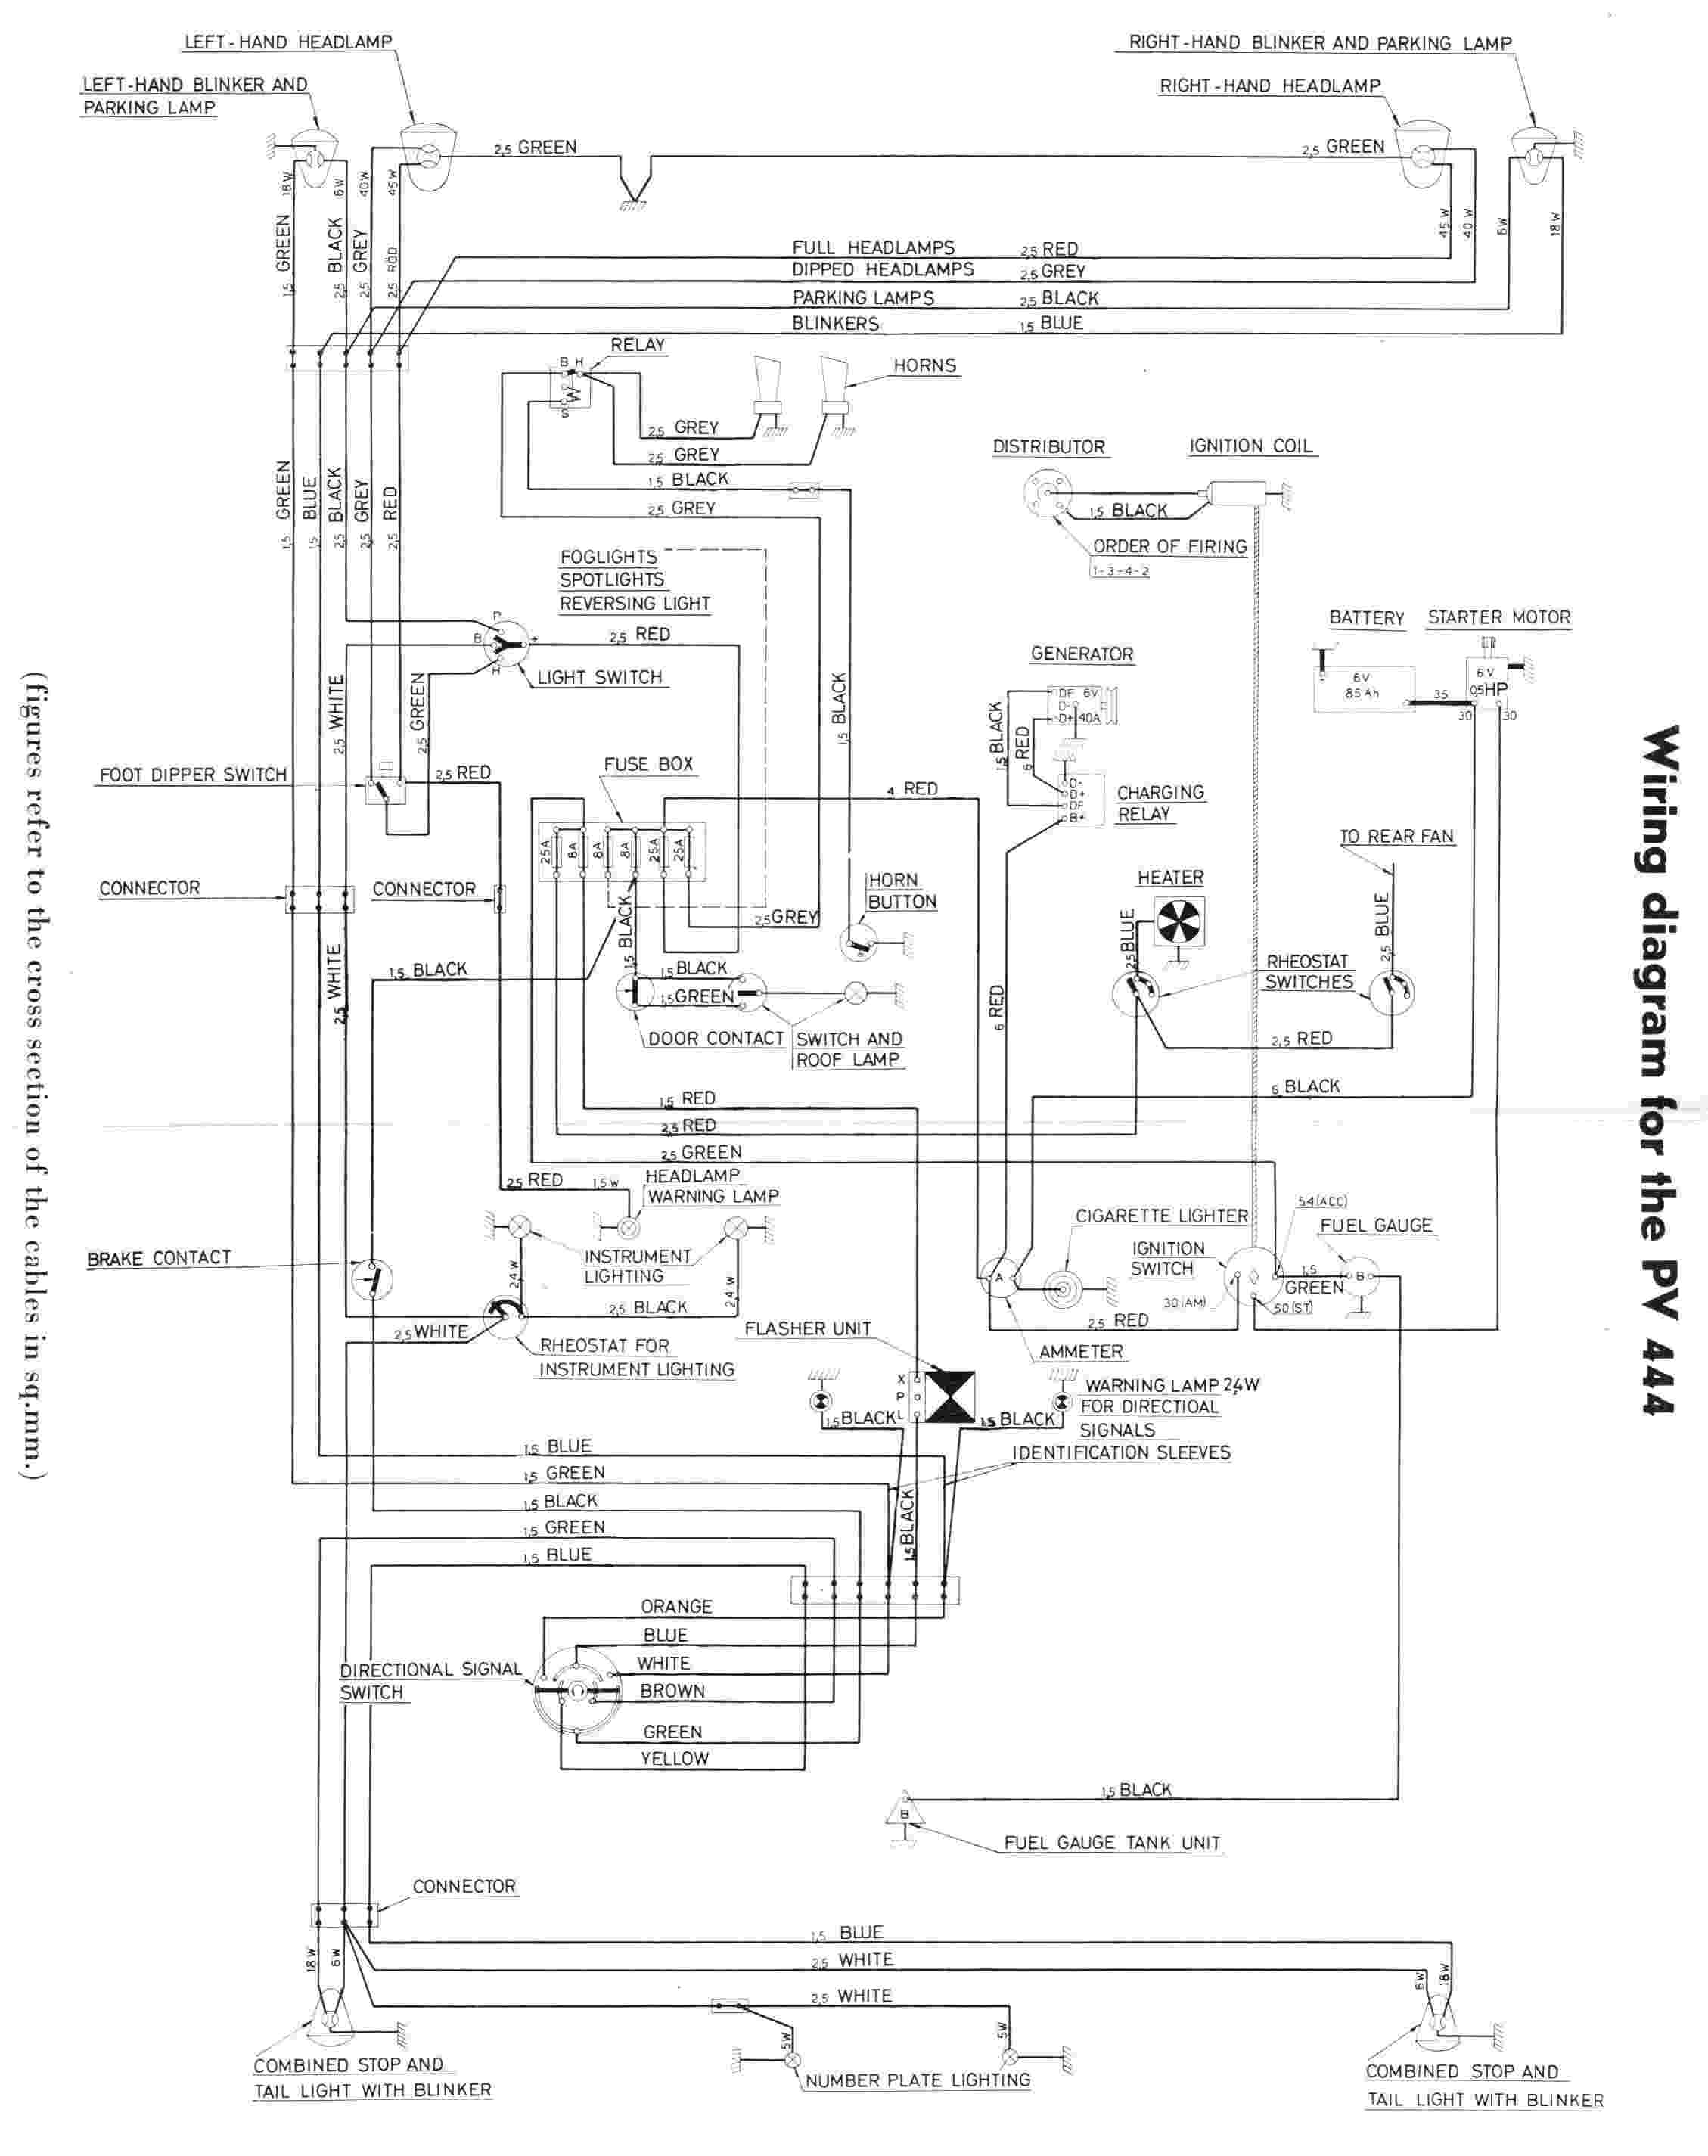 Citroen relay wiring diagram download wiring diagrams schematics magnificent citroen xsara picasso wiring diagram component relay pump diagram relay drawing dorable citroen relay wiring asfbconference2016 Gallery